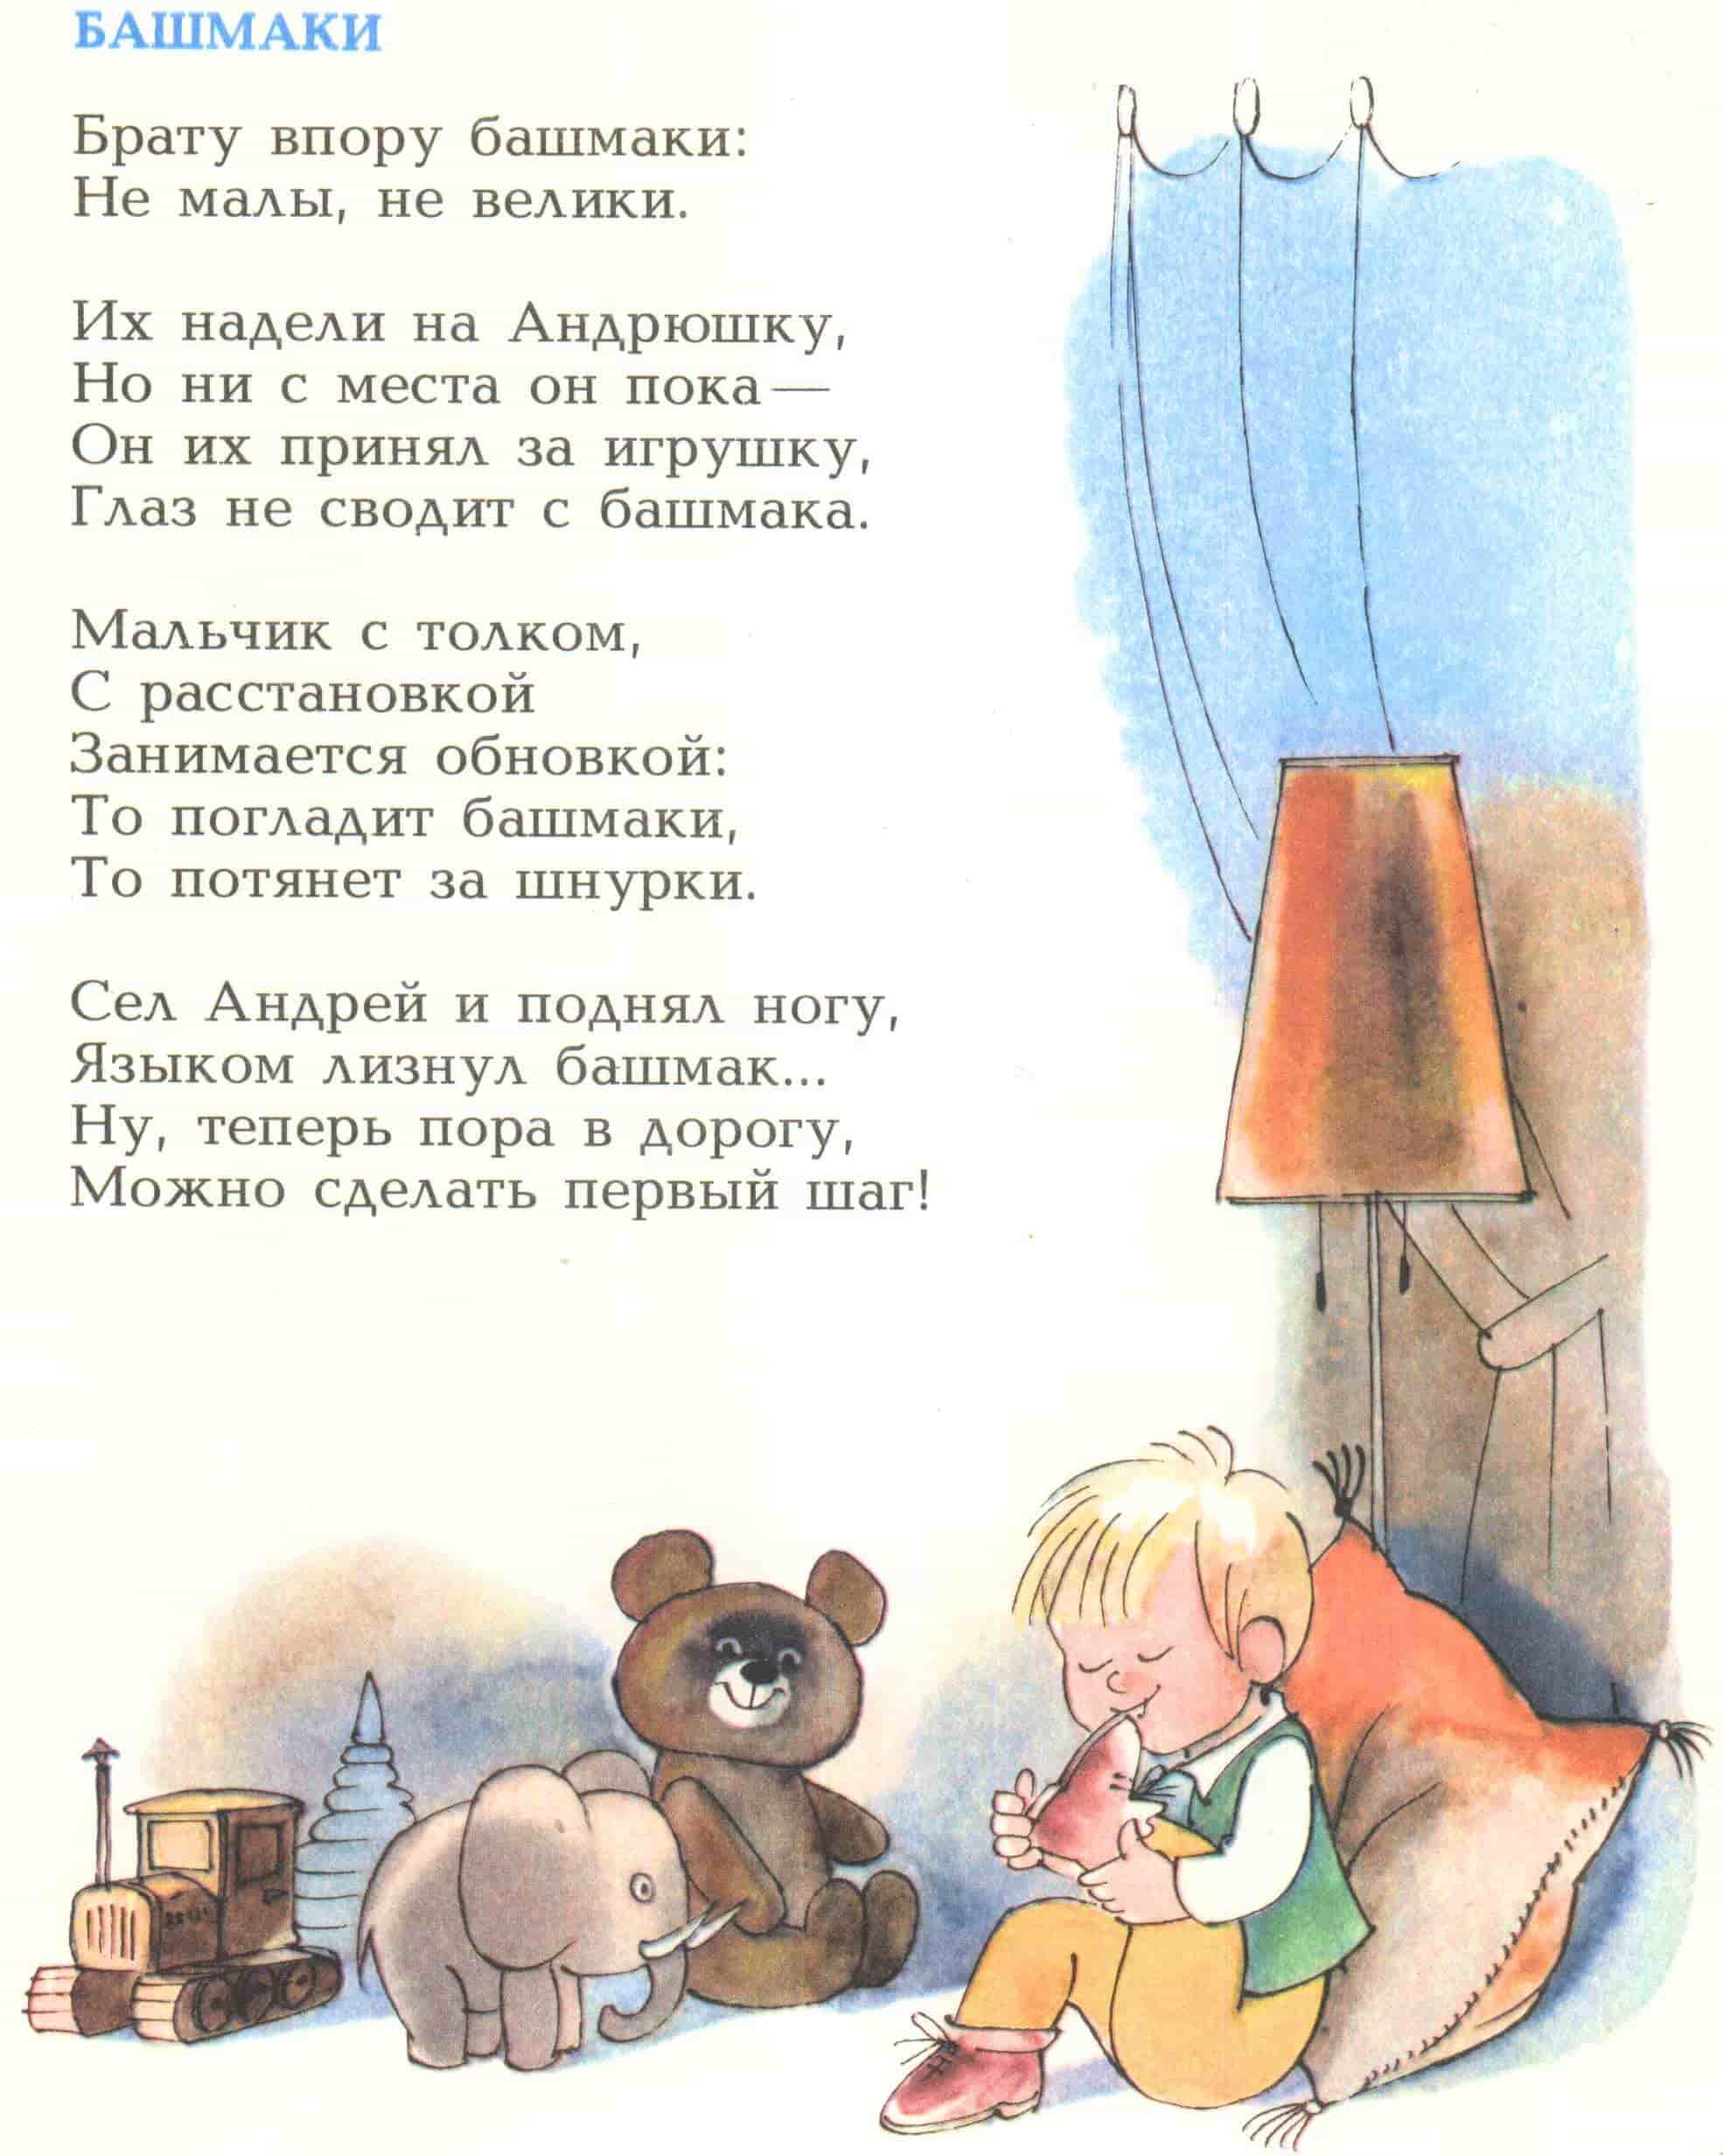 "Стих ""Башмаки"" текст и картинка"